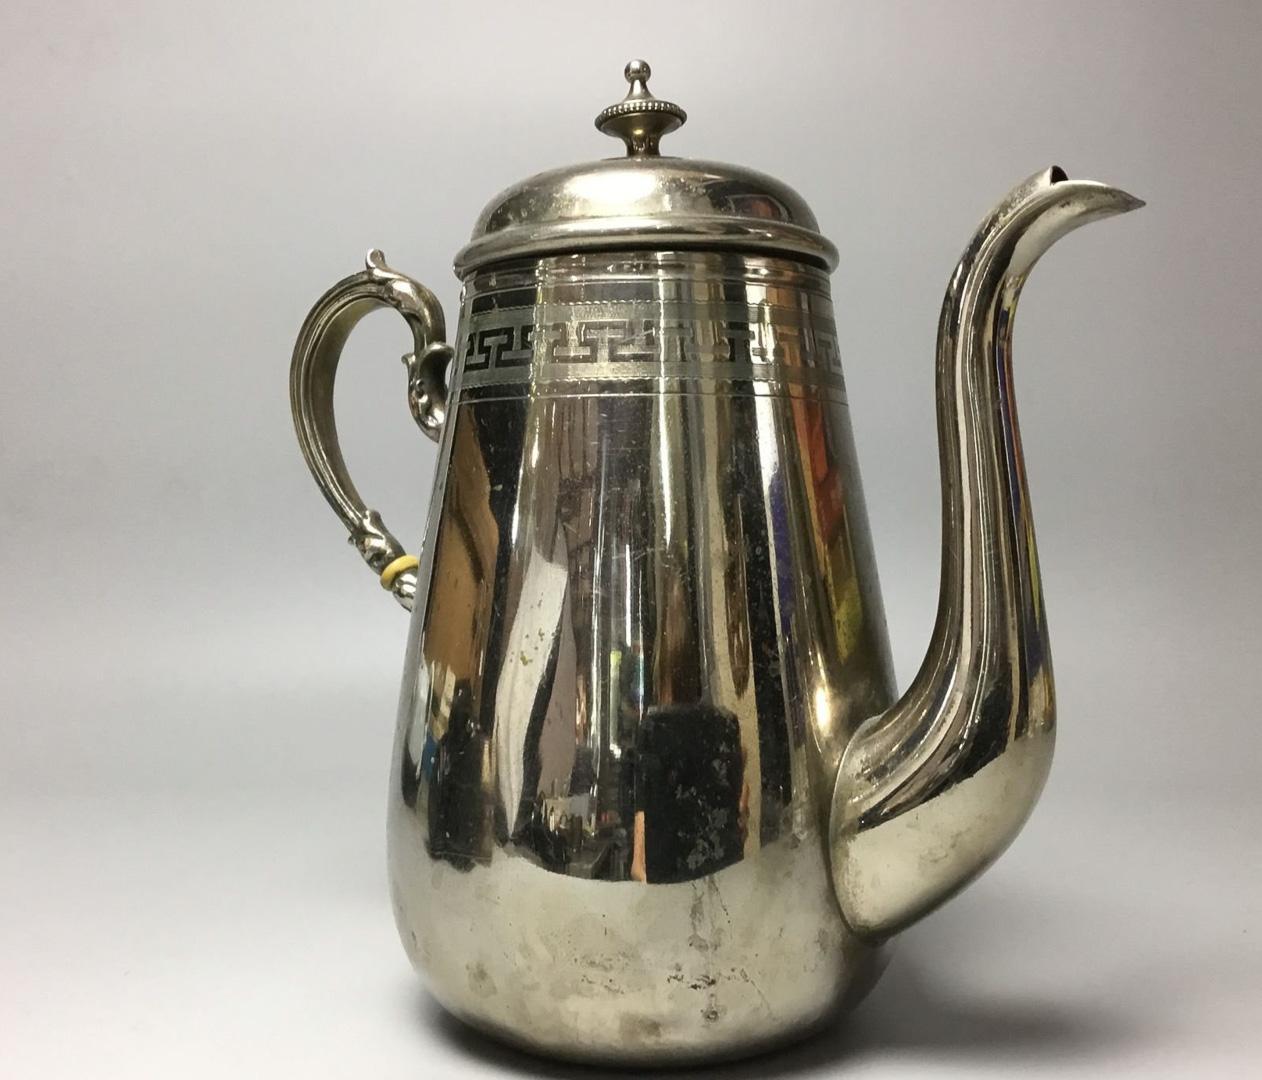 Кофейник металл серебрение Варшава модерн